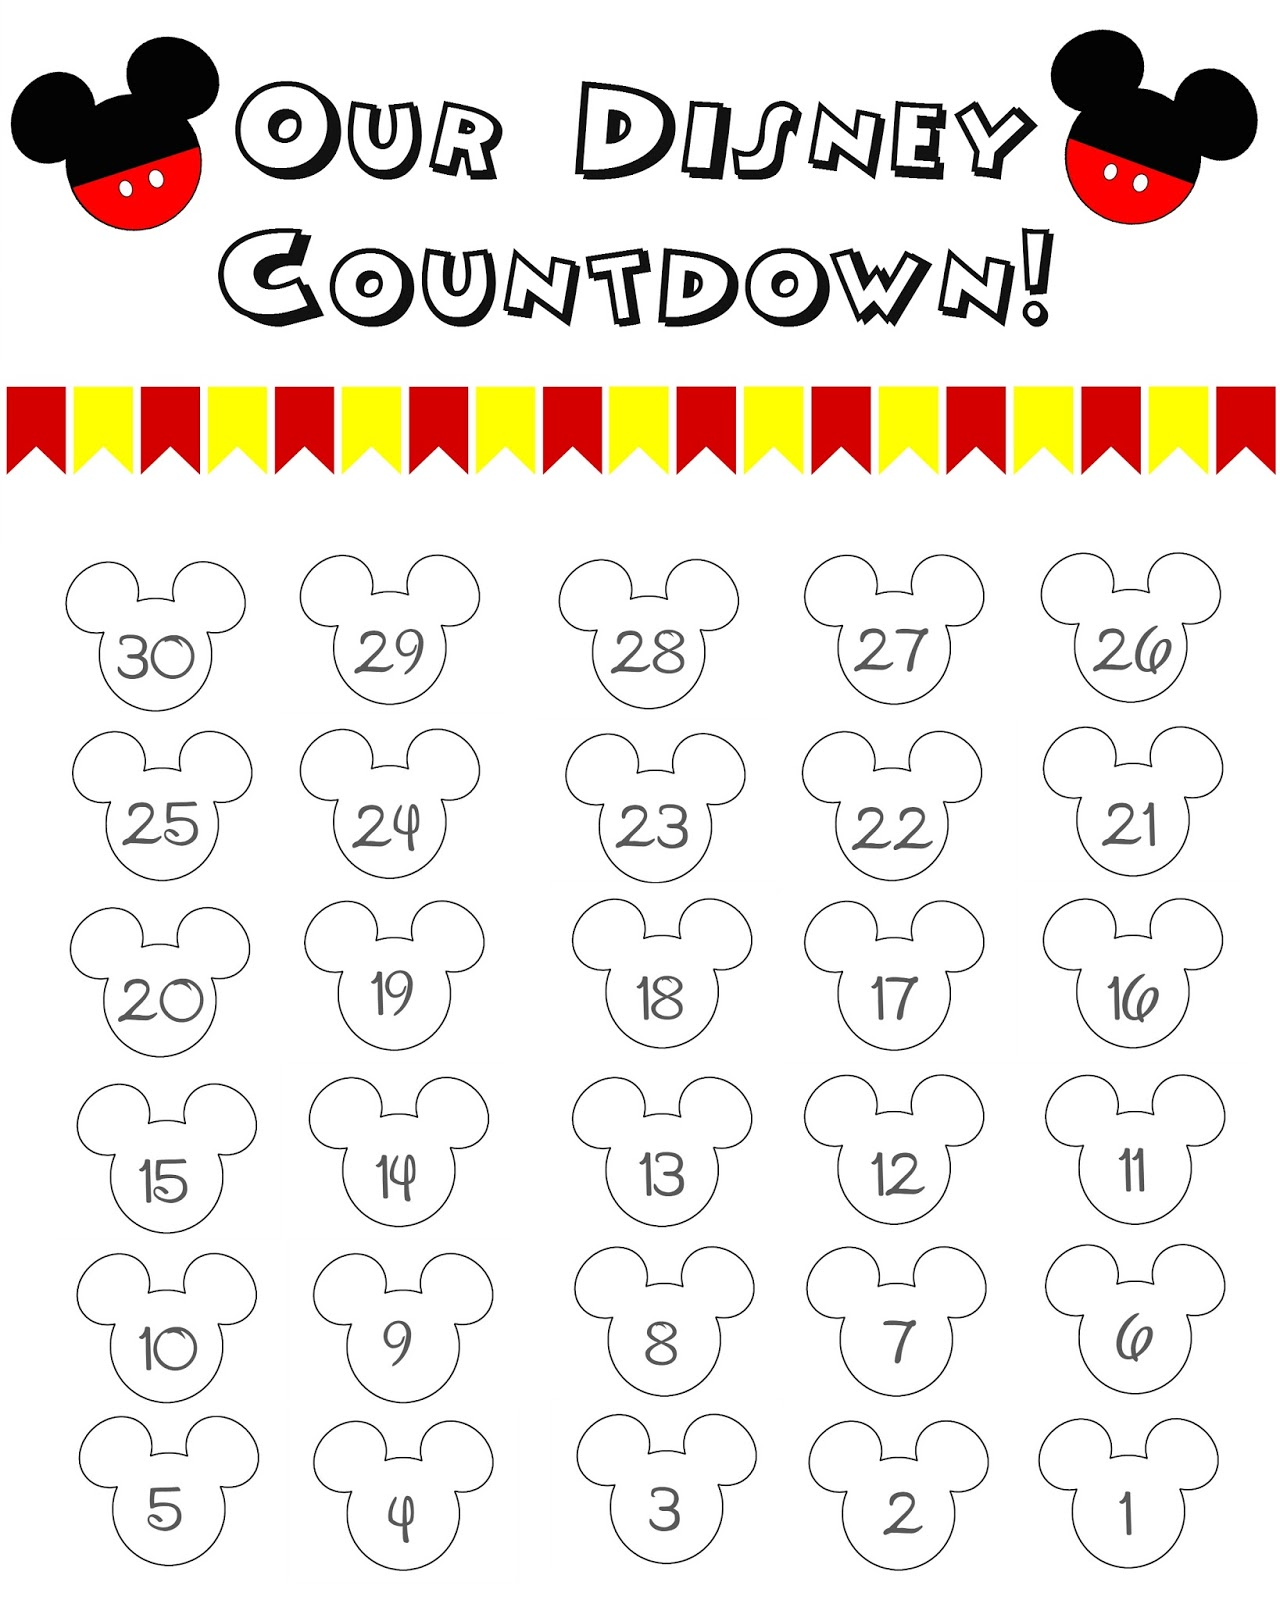 Disney World Countdown Calendar